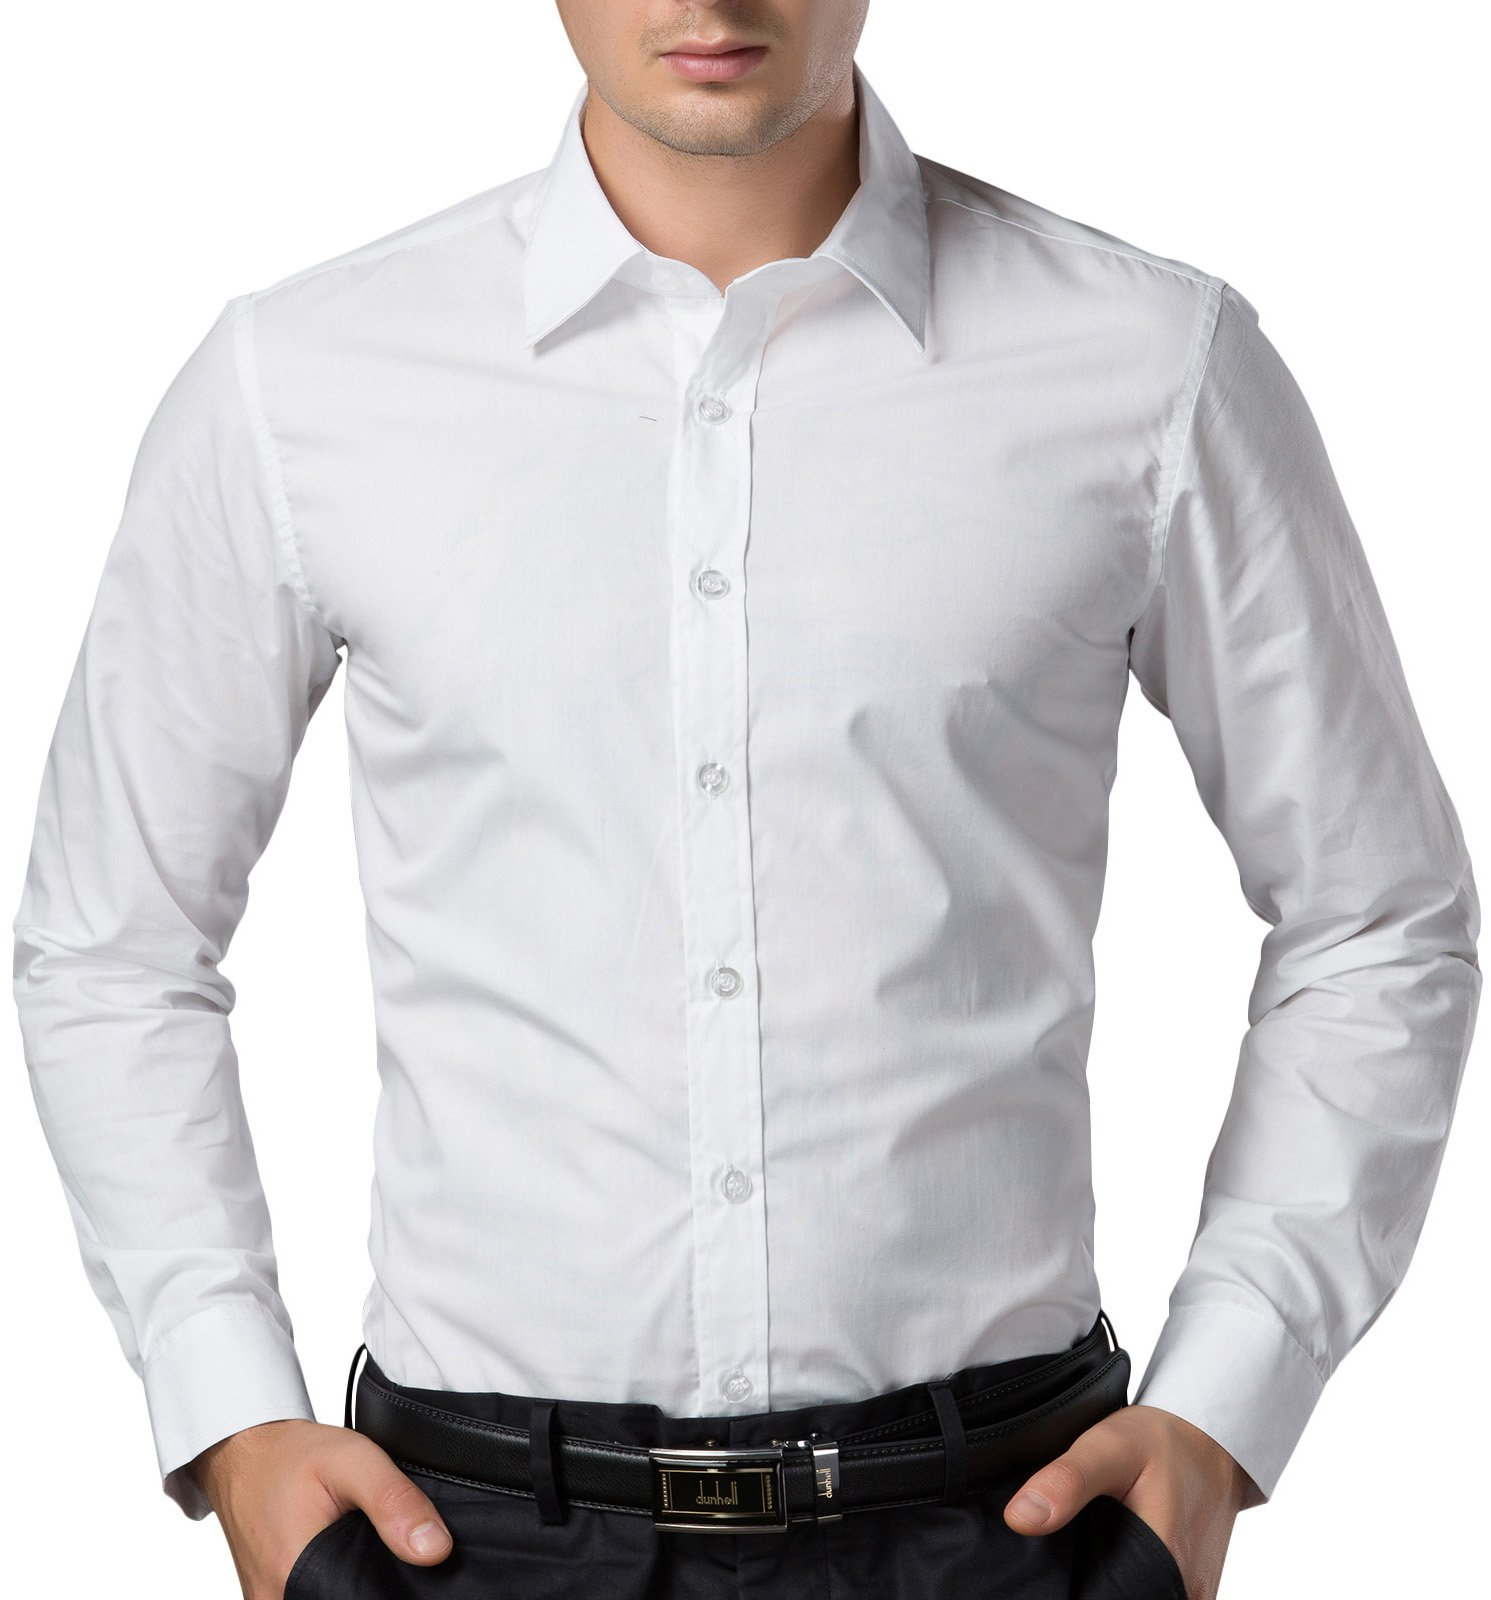 PAUL JONES White Dress Shirt for Men Slim Fit Button Down Shirt Size XL